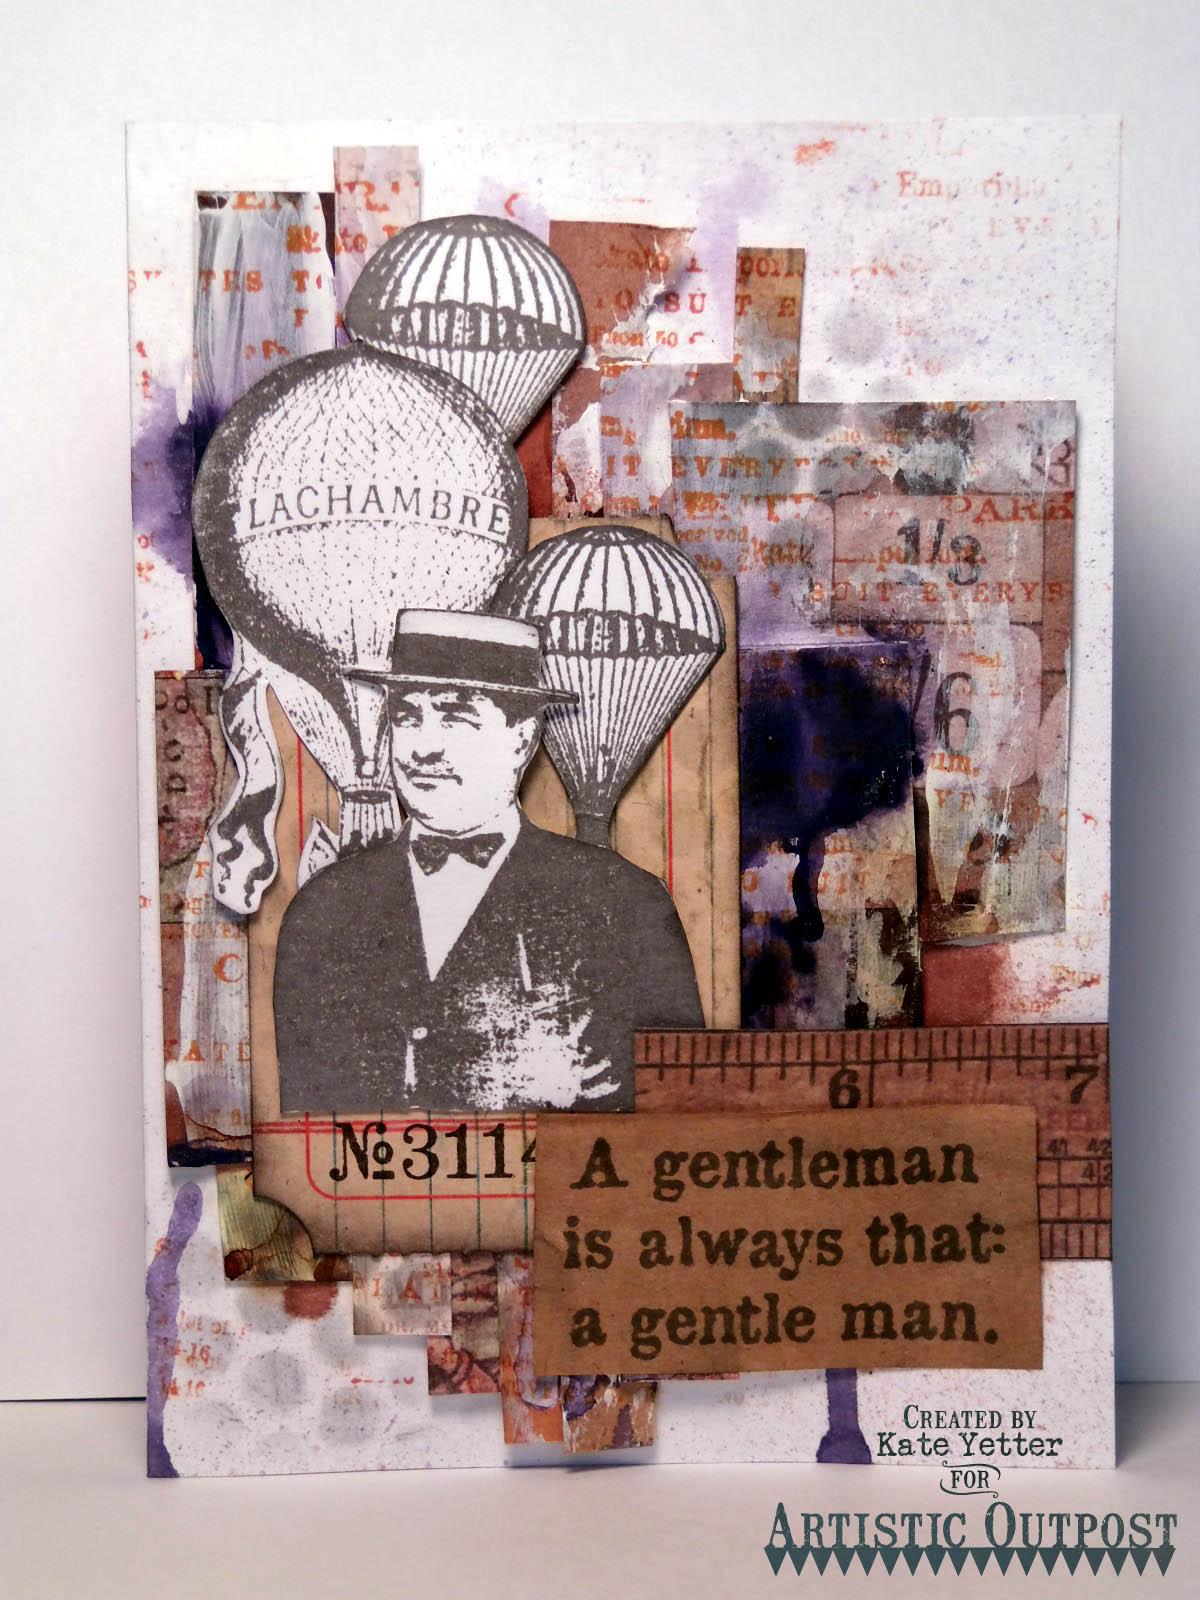 Stamps - Artistic Outpost Hat's Off, Paris Exposition, Skating Emporium